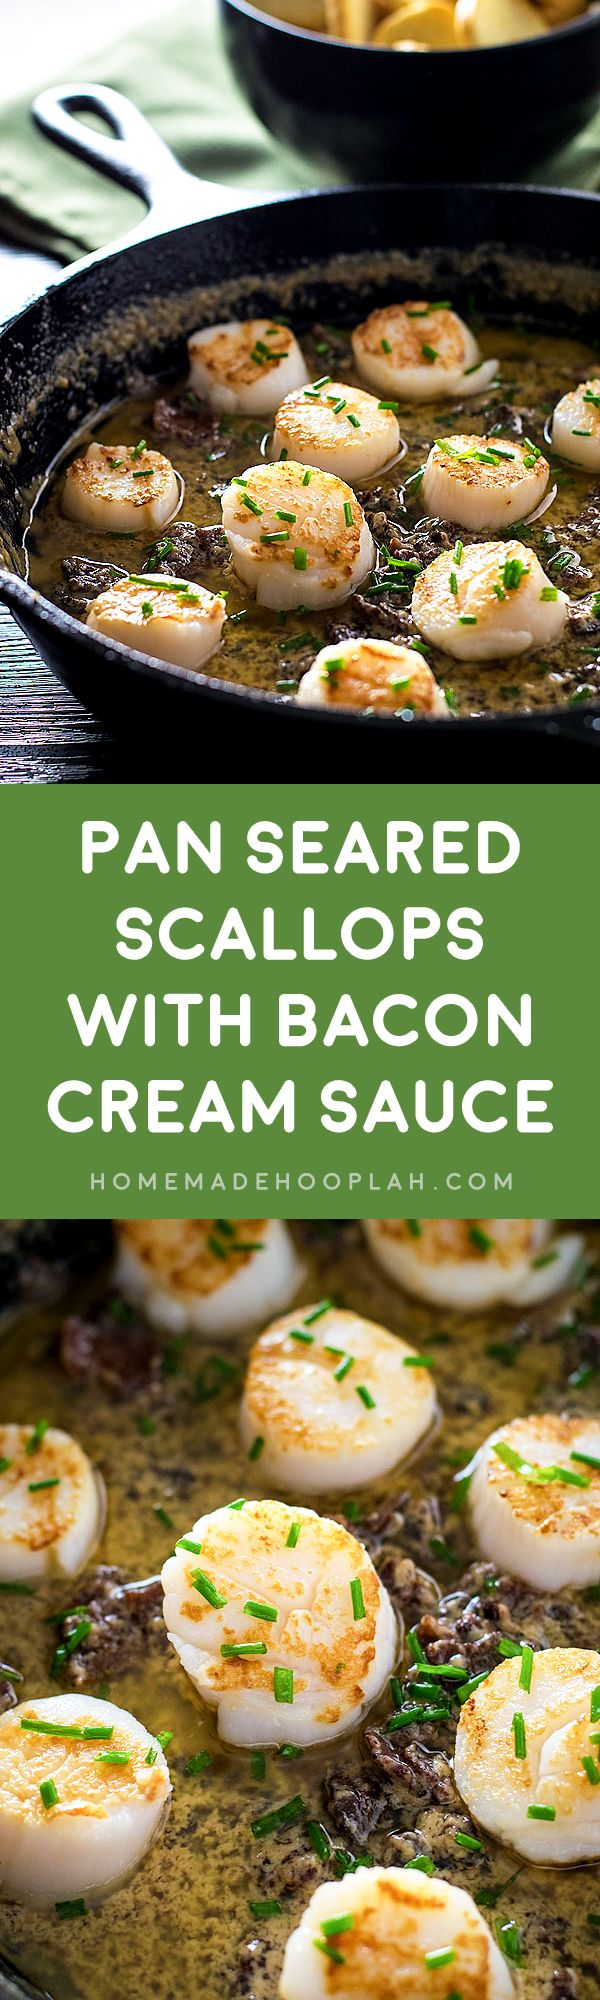 ... Seared Scallops on Pinterest   Scallops, Pan Seared Scallops and